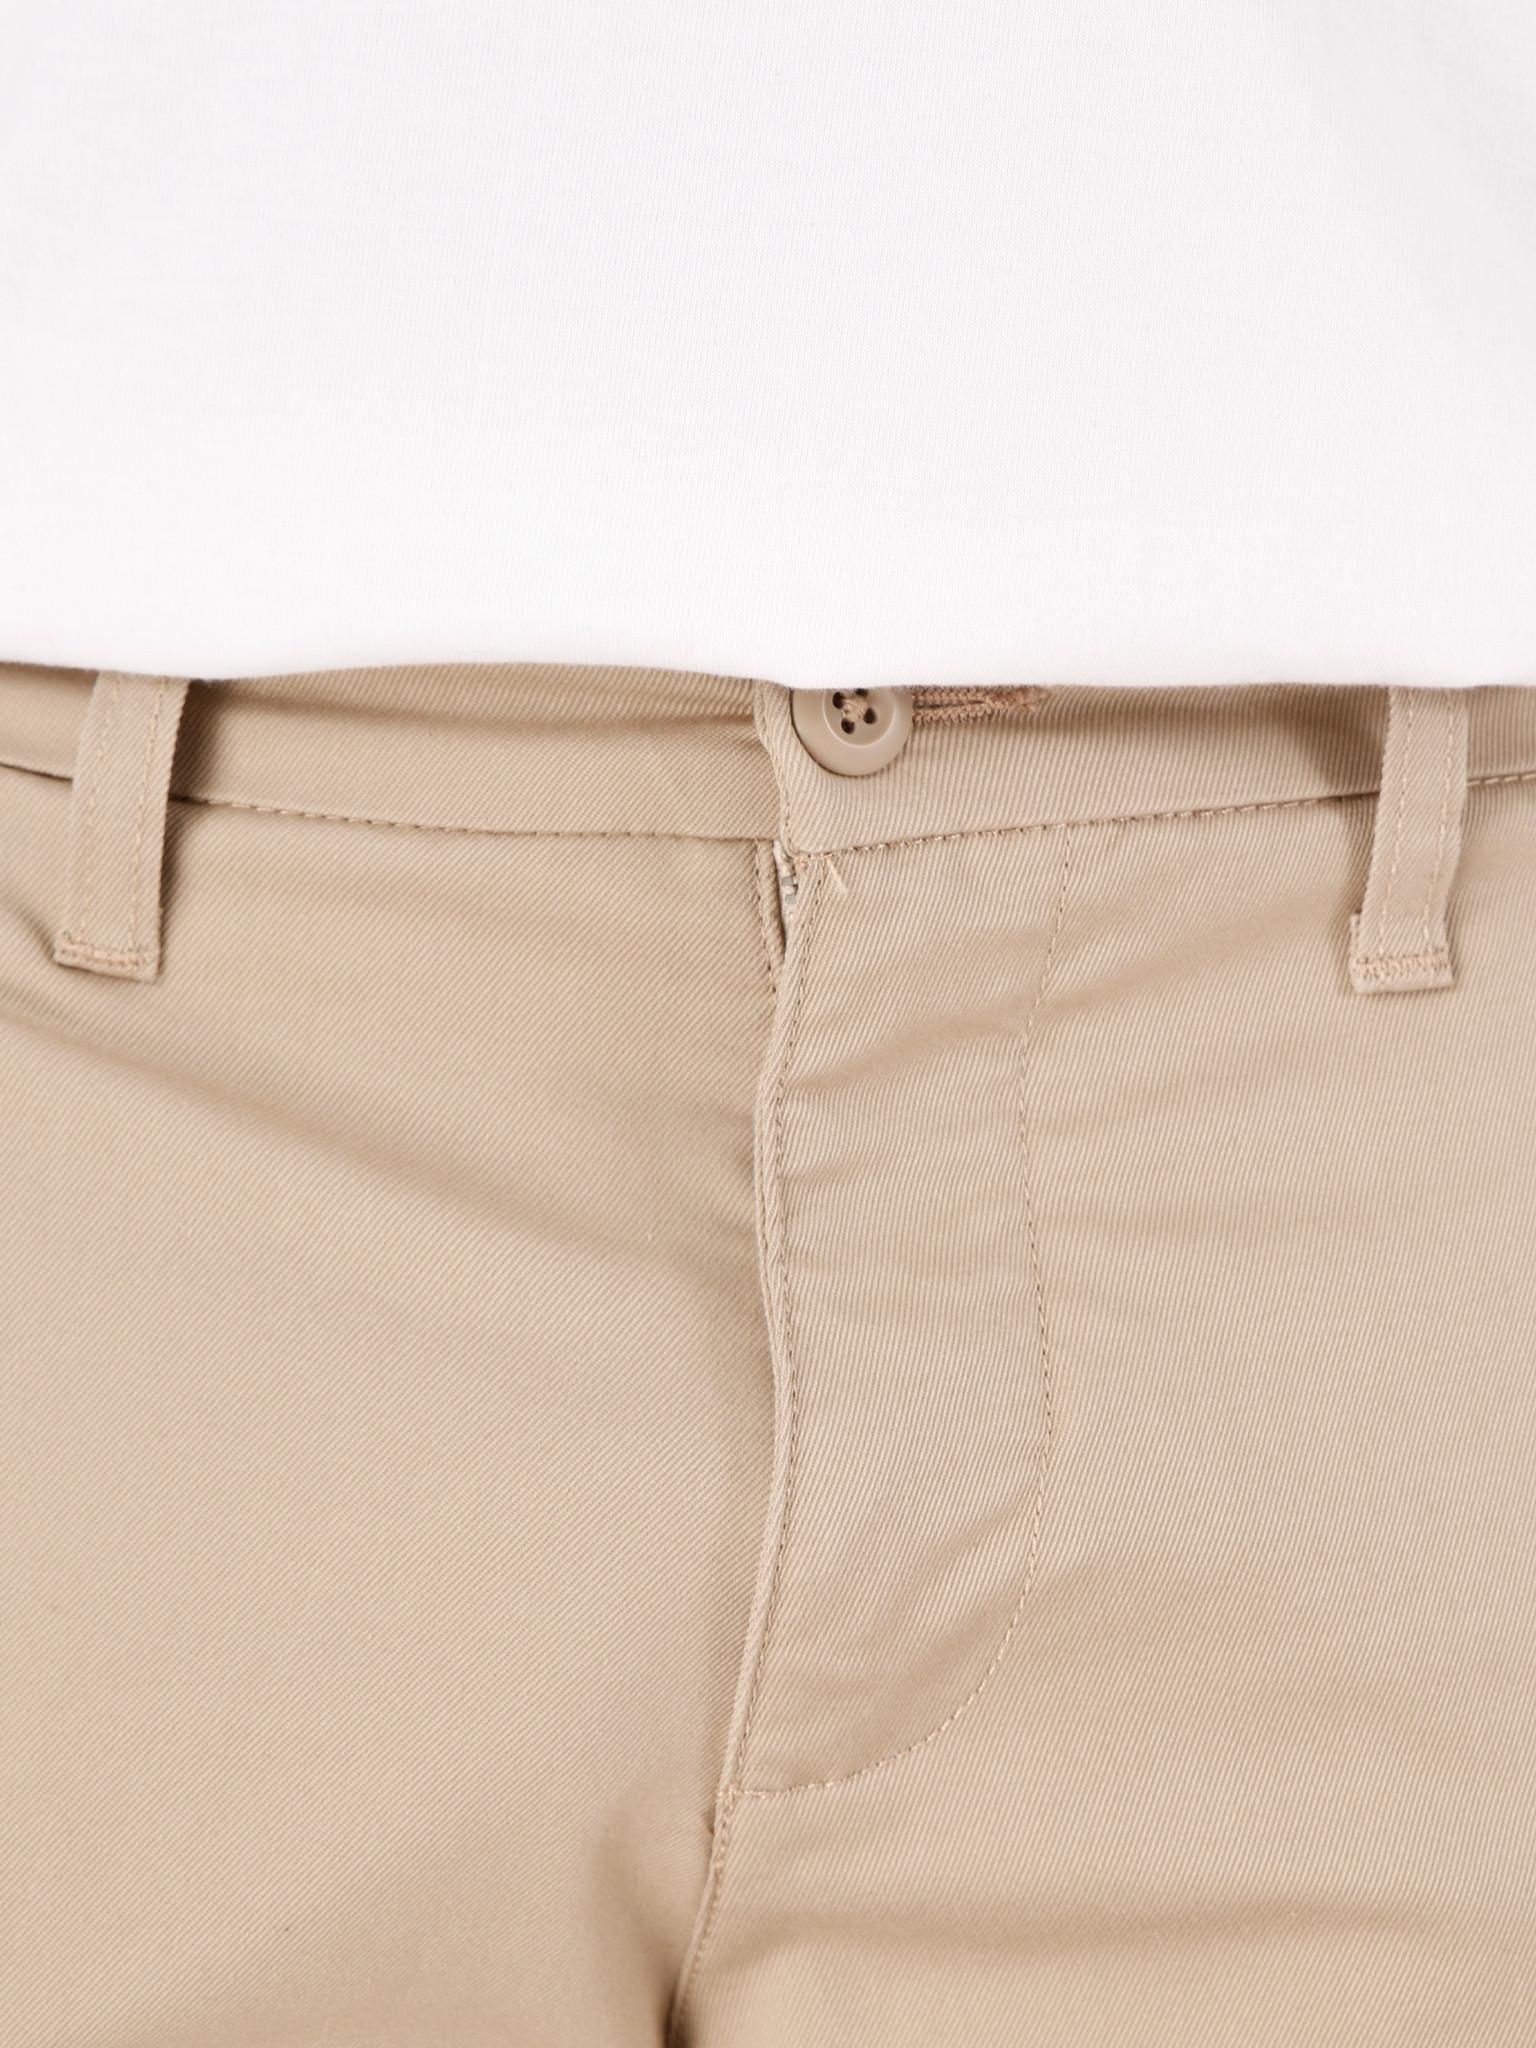 Carhartt WIP Carhartt WIP Sid Pant Wall Rinsed I003367-G102